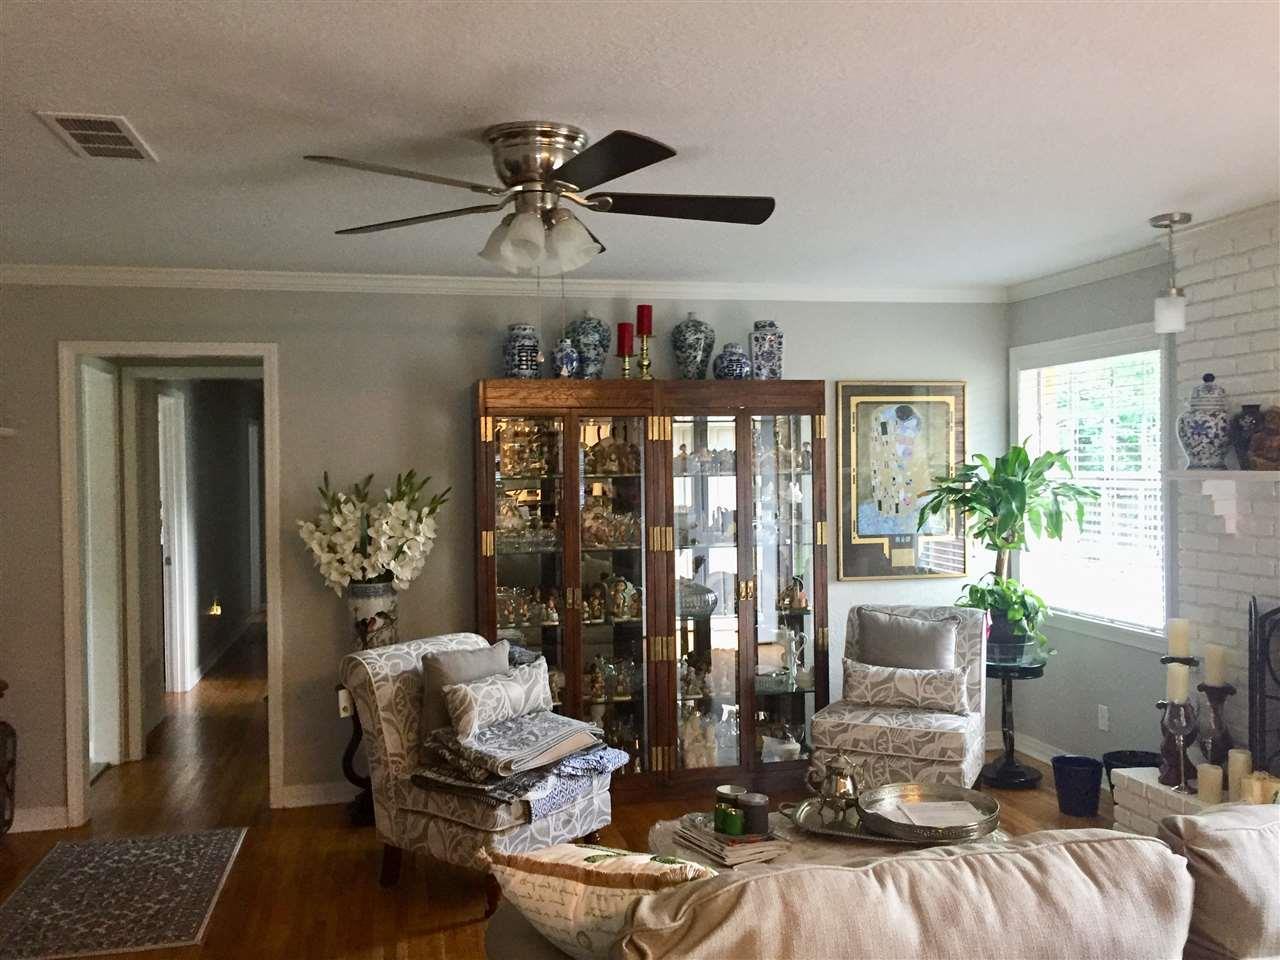 2 S 71st Ave, Pensacola, FL 32506